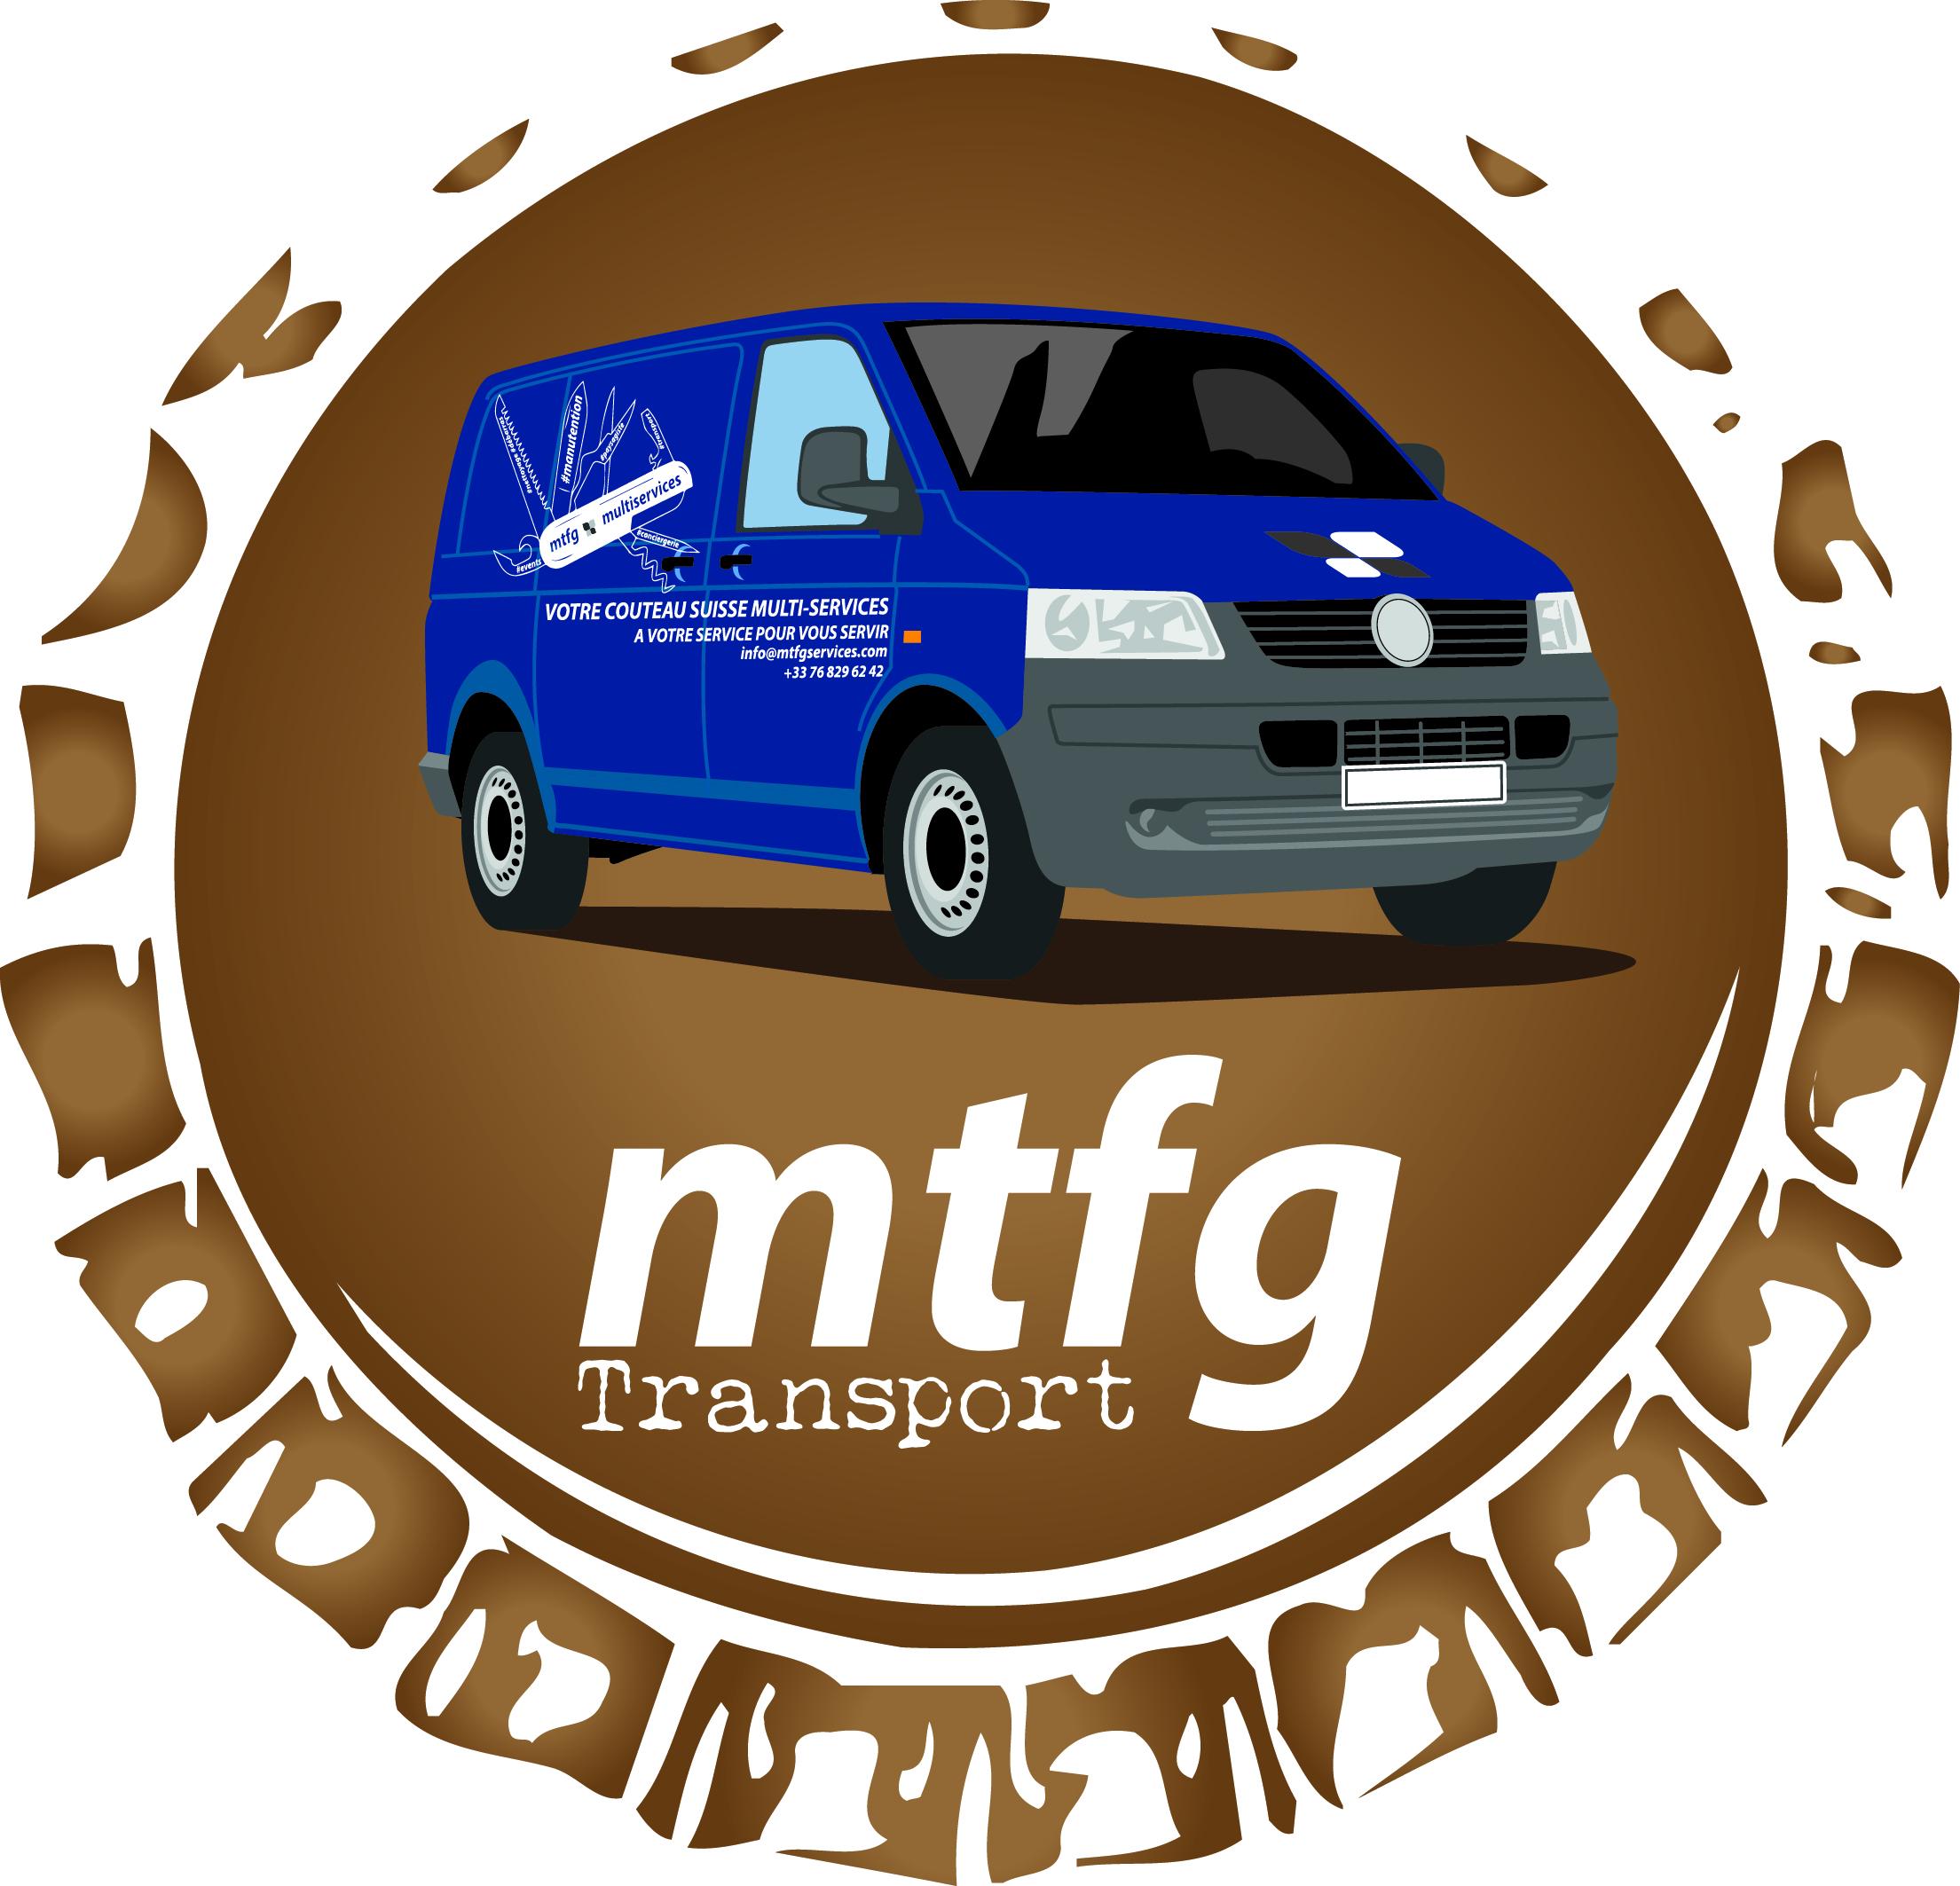 MTFG Transport